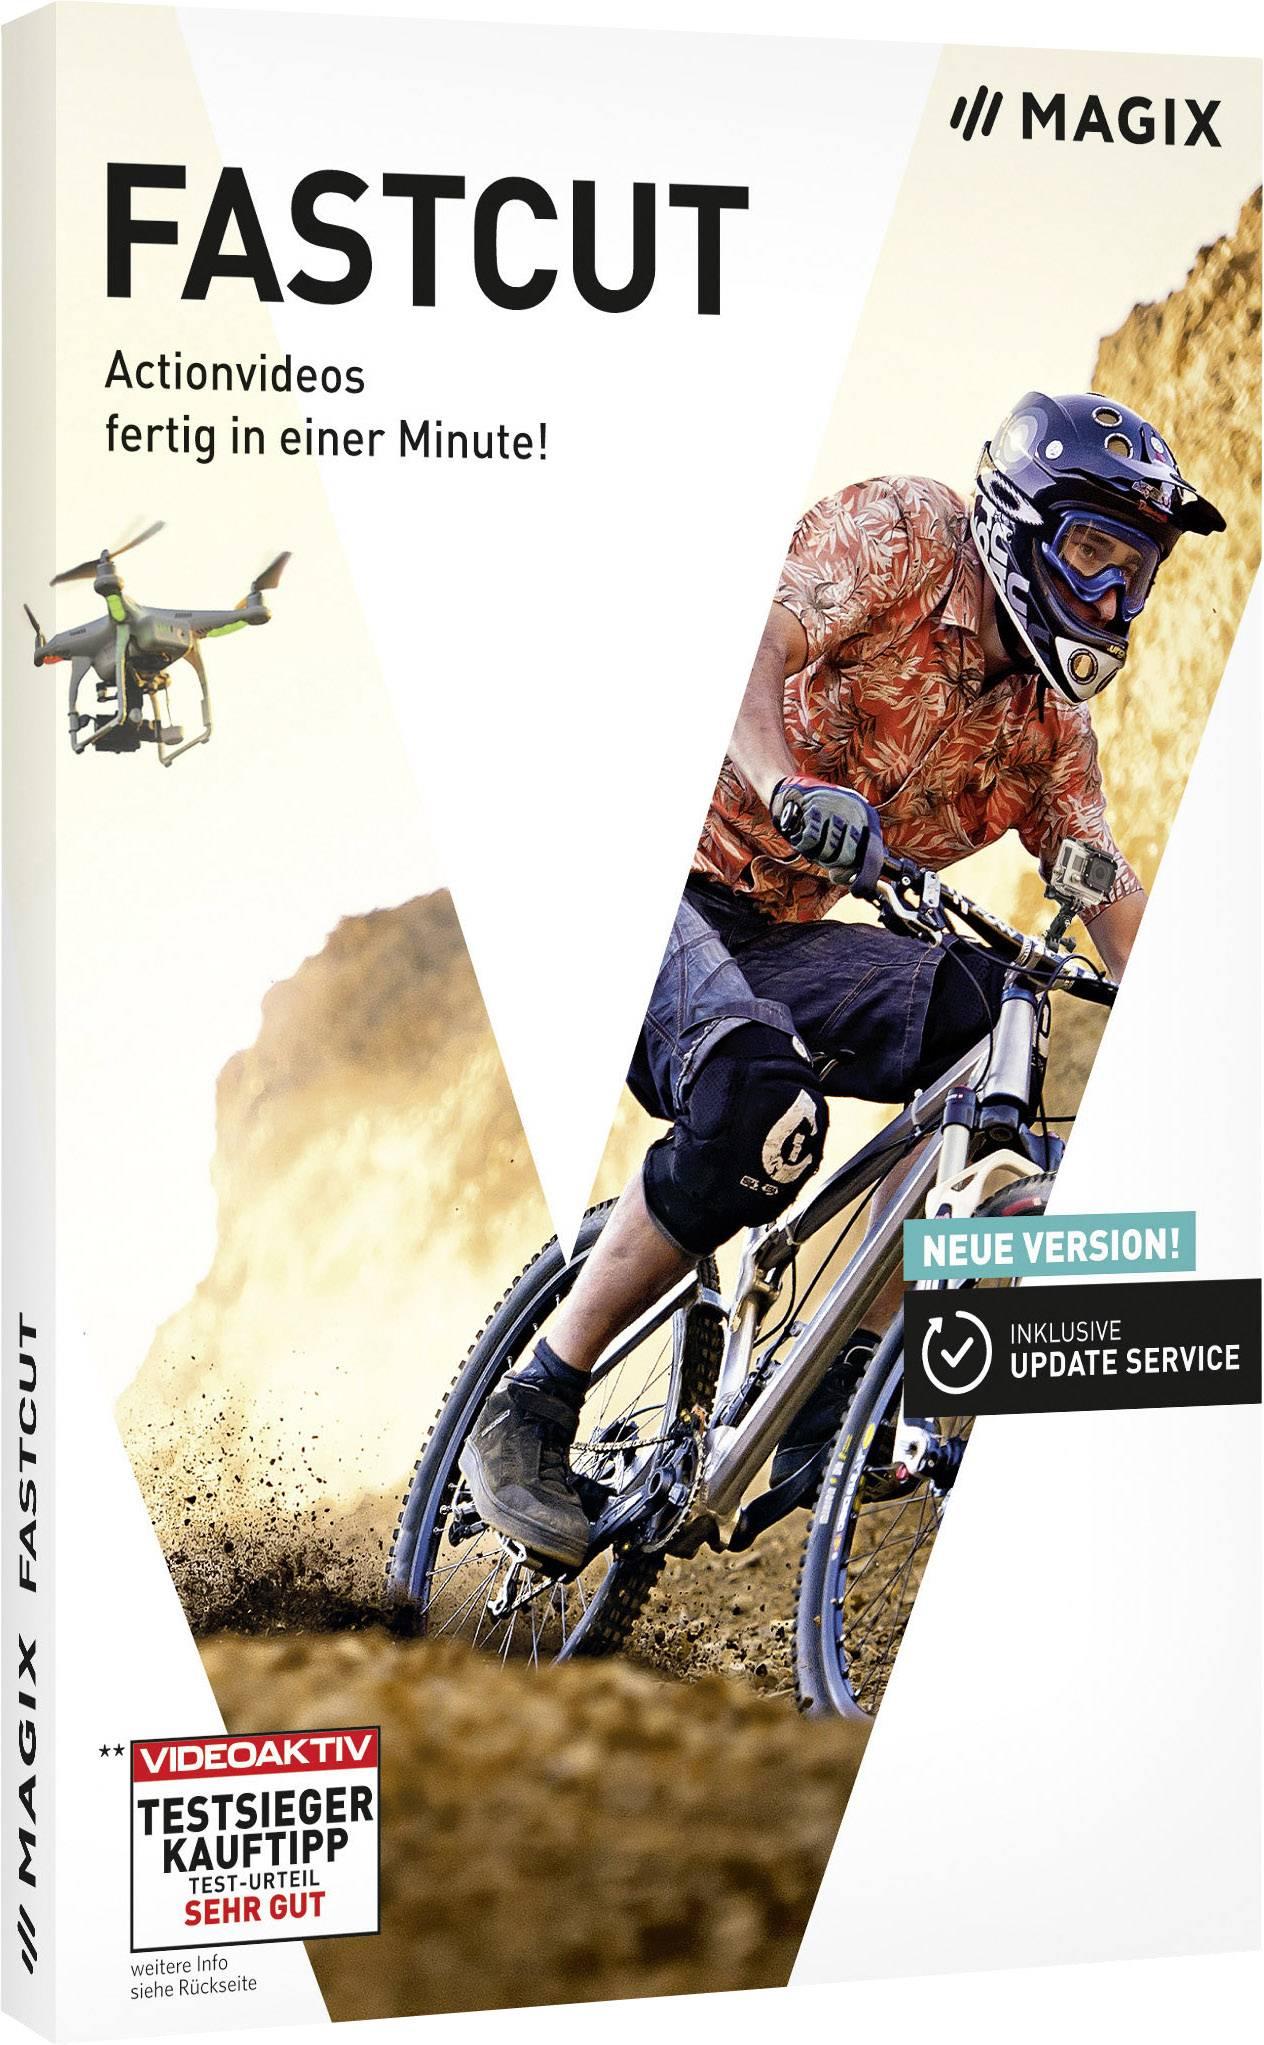 Magix Fastcut Full version, 1 license Windows Video editor   Conrad com